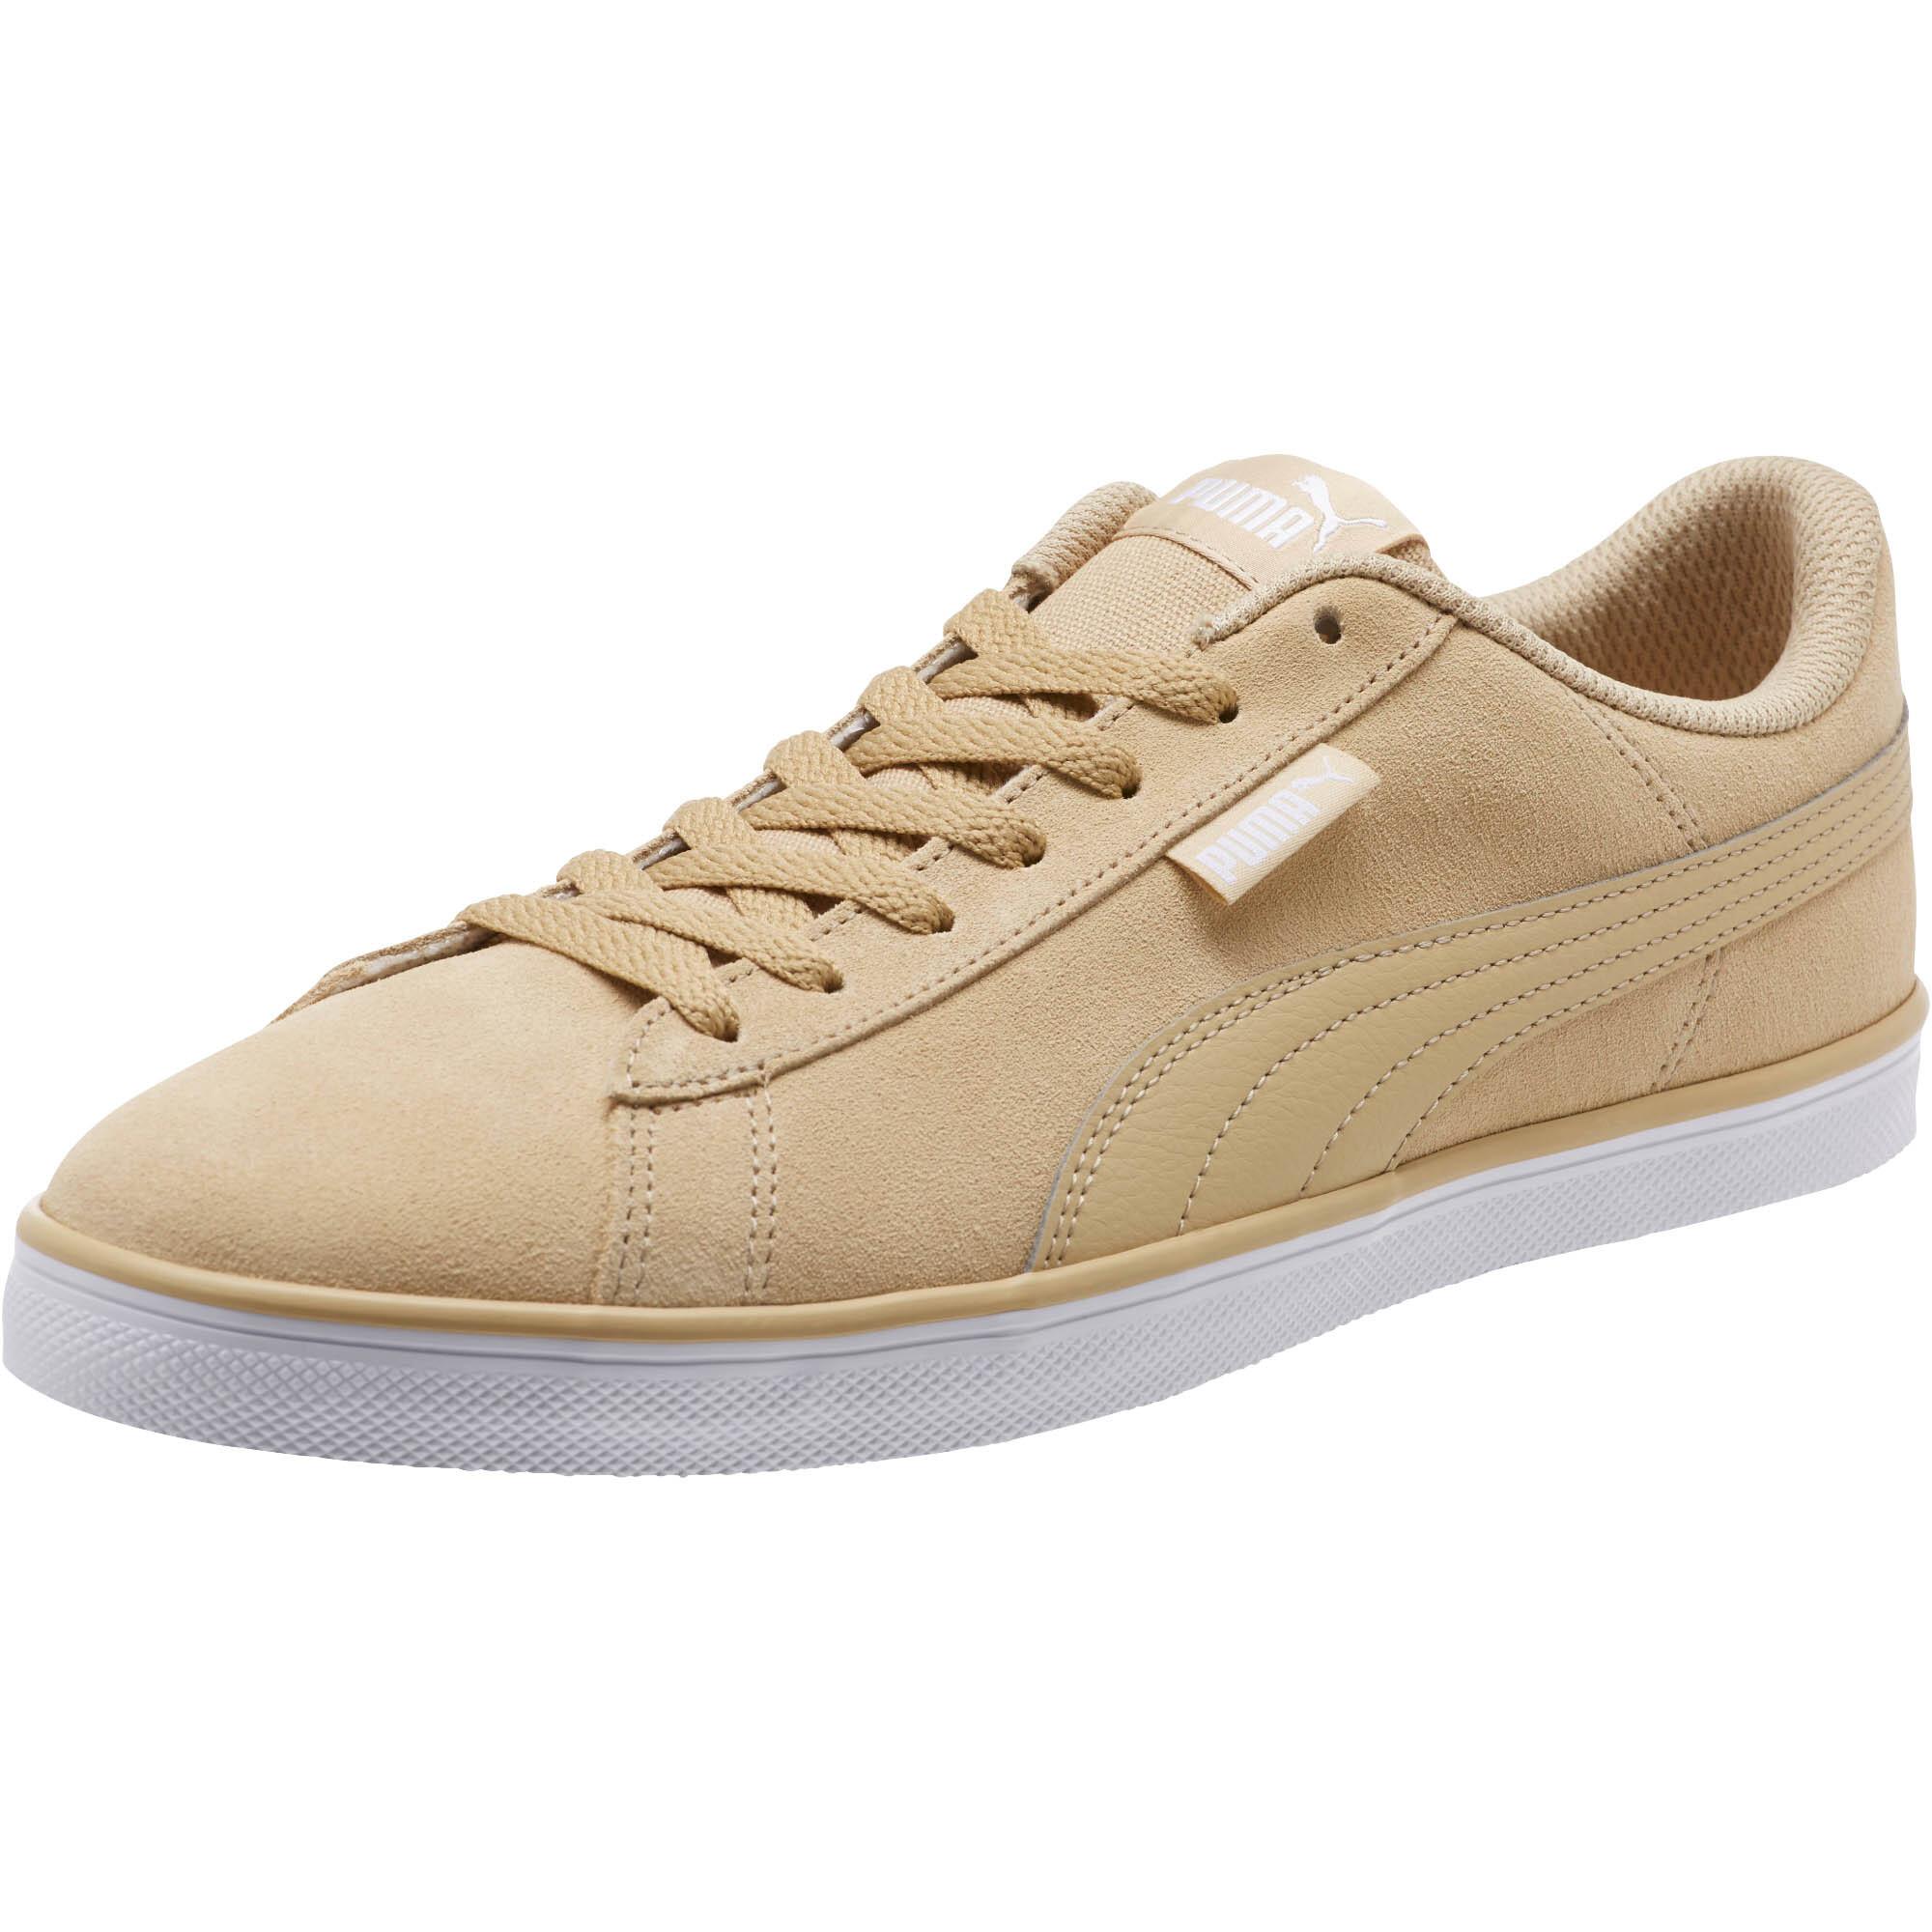 PUMA-Urban-Plus-Suede-Sneakers-Men-Shoe-Basics thumbnail 26